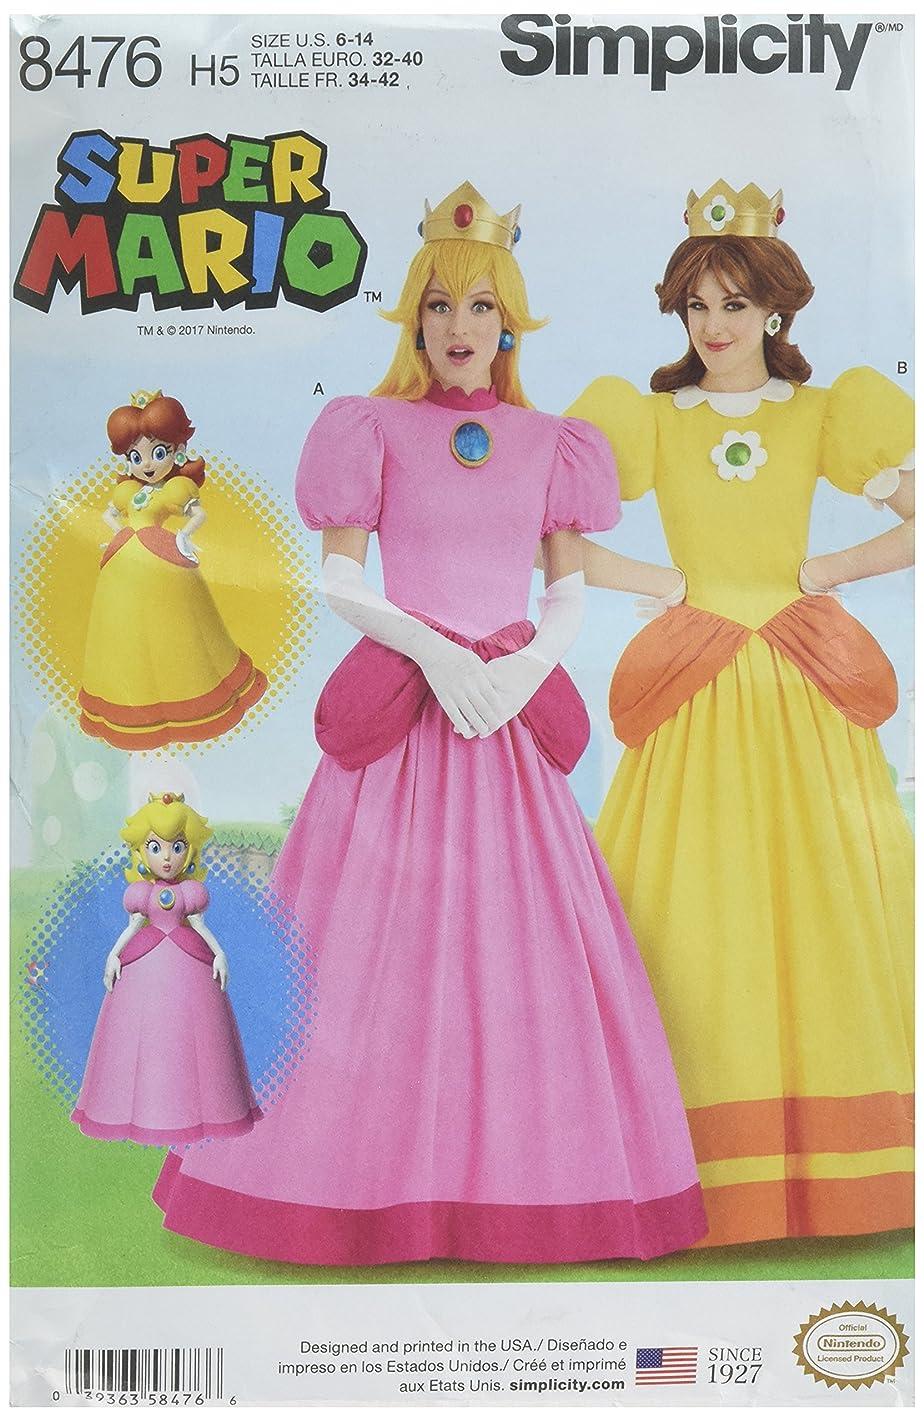 Simplicity Women's Nintendo Super Mario Princess Peach and Princess Daisy Costume Sewing Patterns, Sizes 6-14